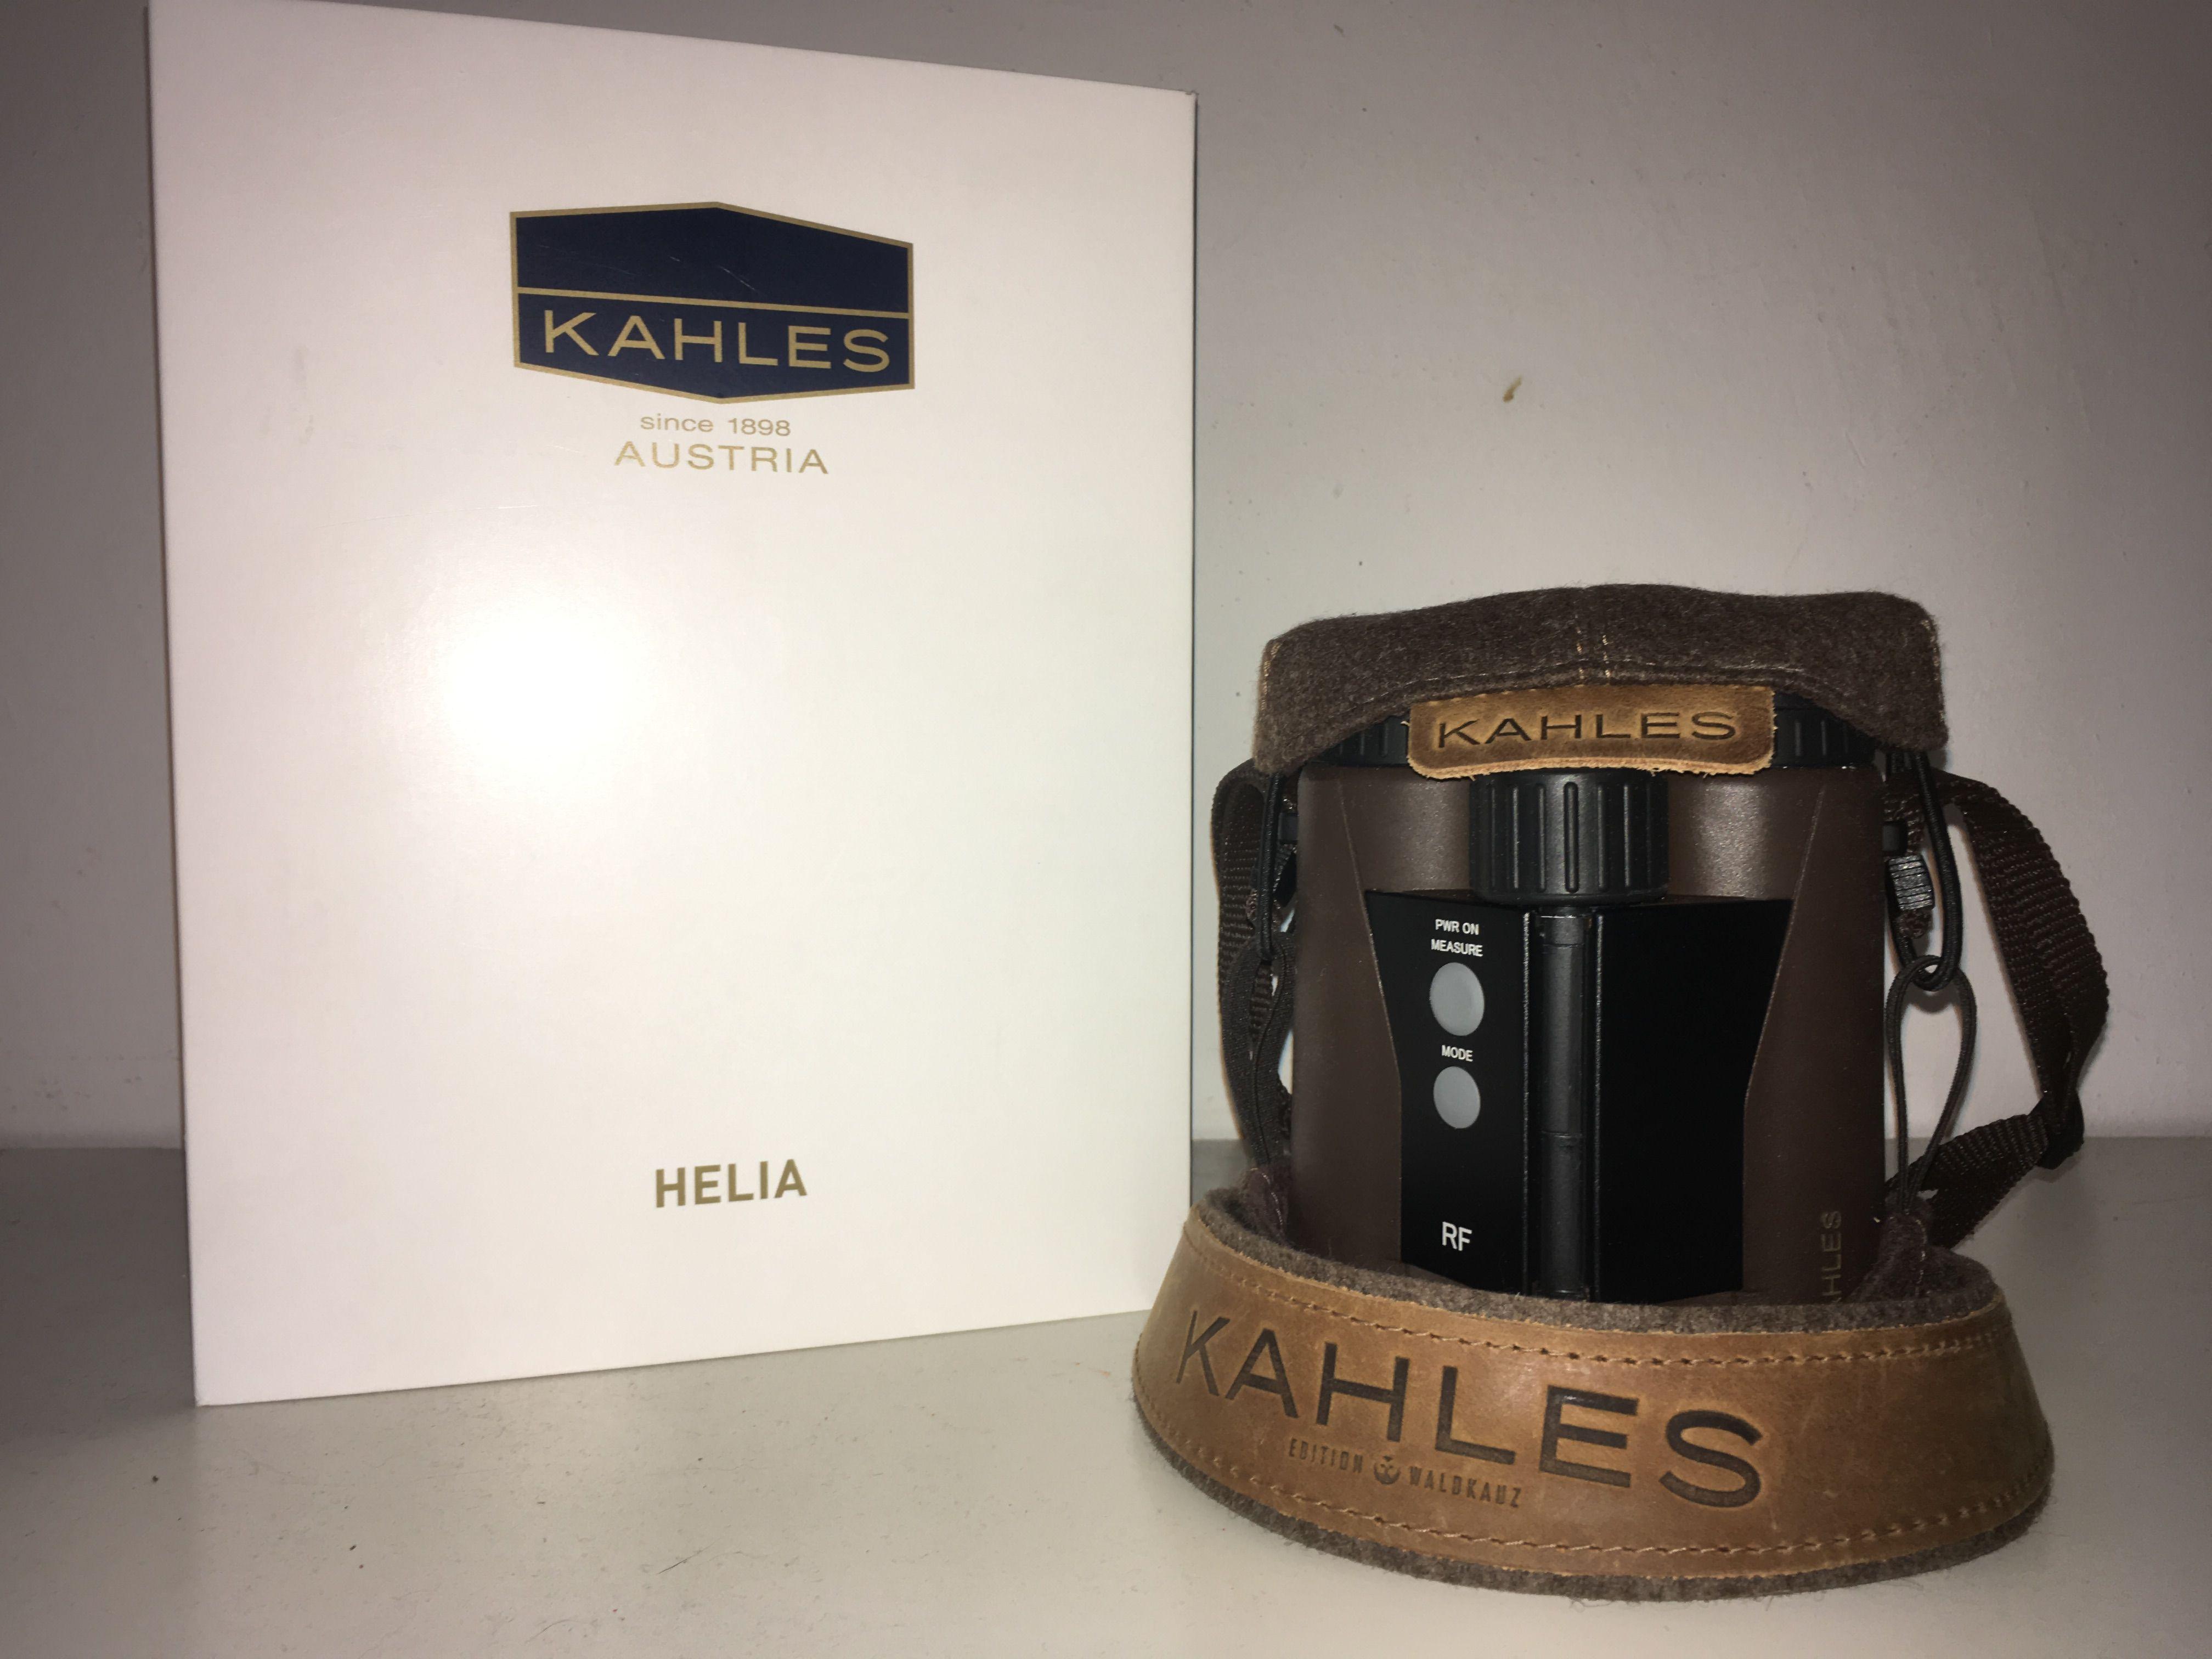 Kahles Fernglas Mit Entfernungsmesser Kaufen : Kahles helia rangefinder